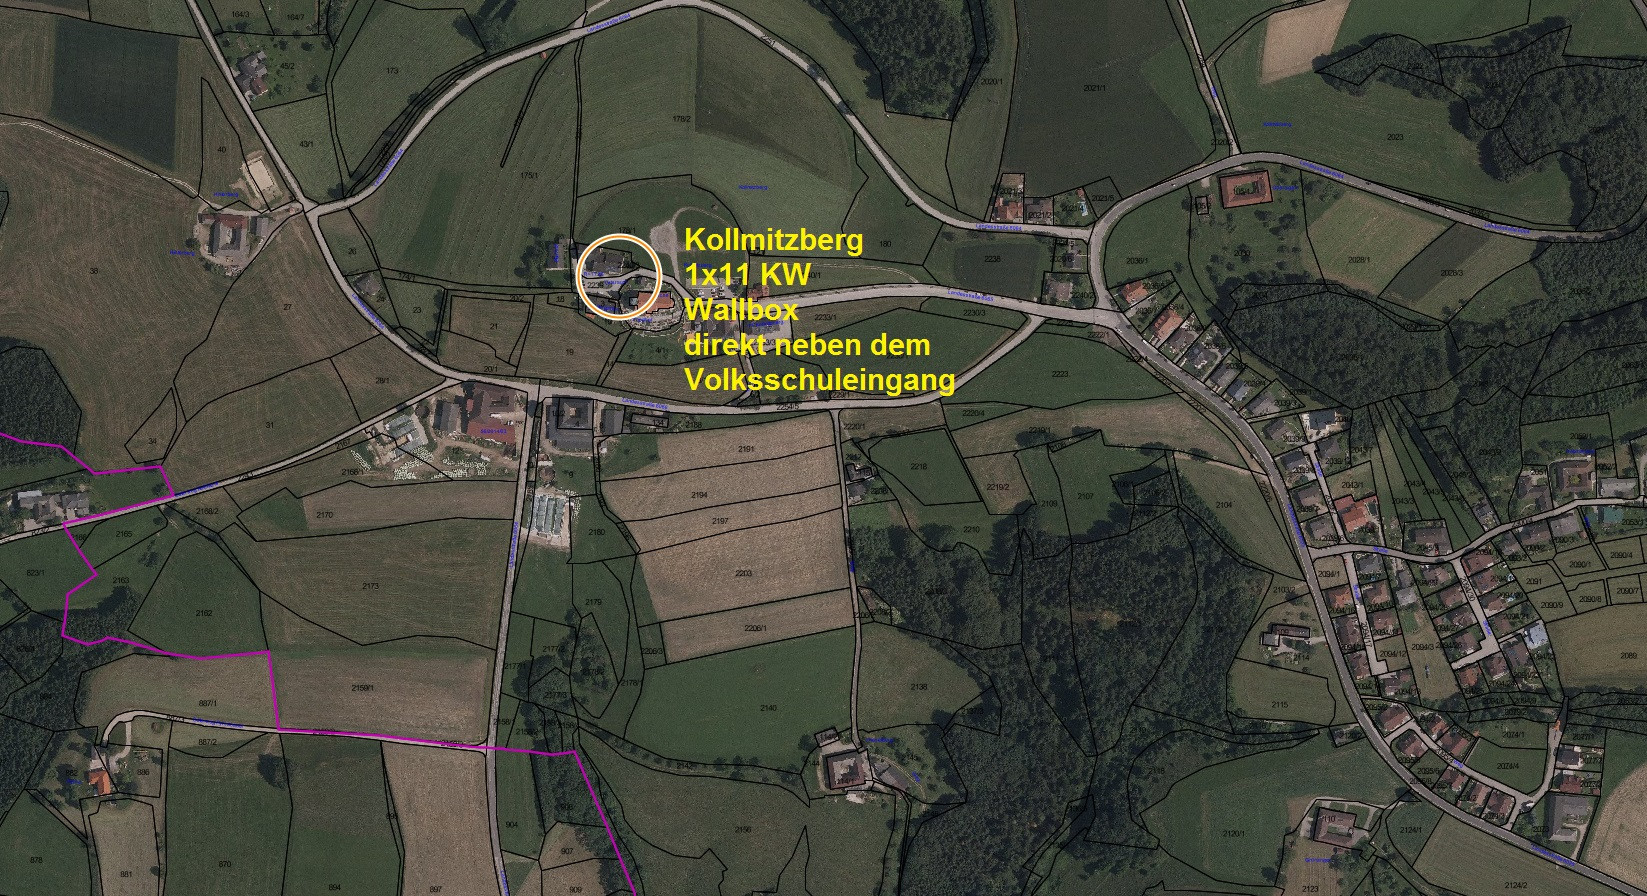 Standort_E-tankstelle-kollmtibzerg.jpg